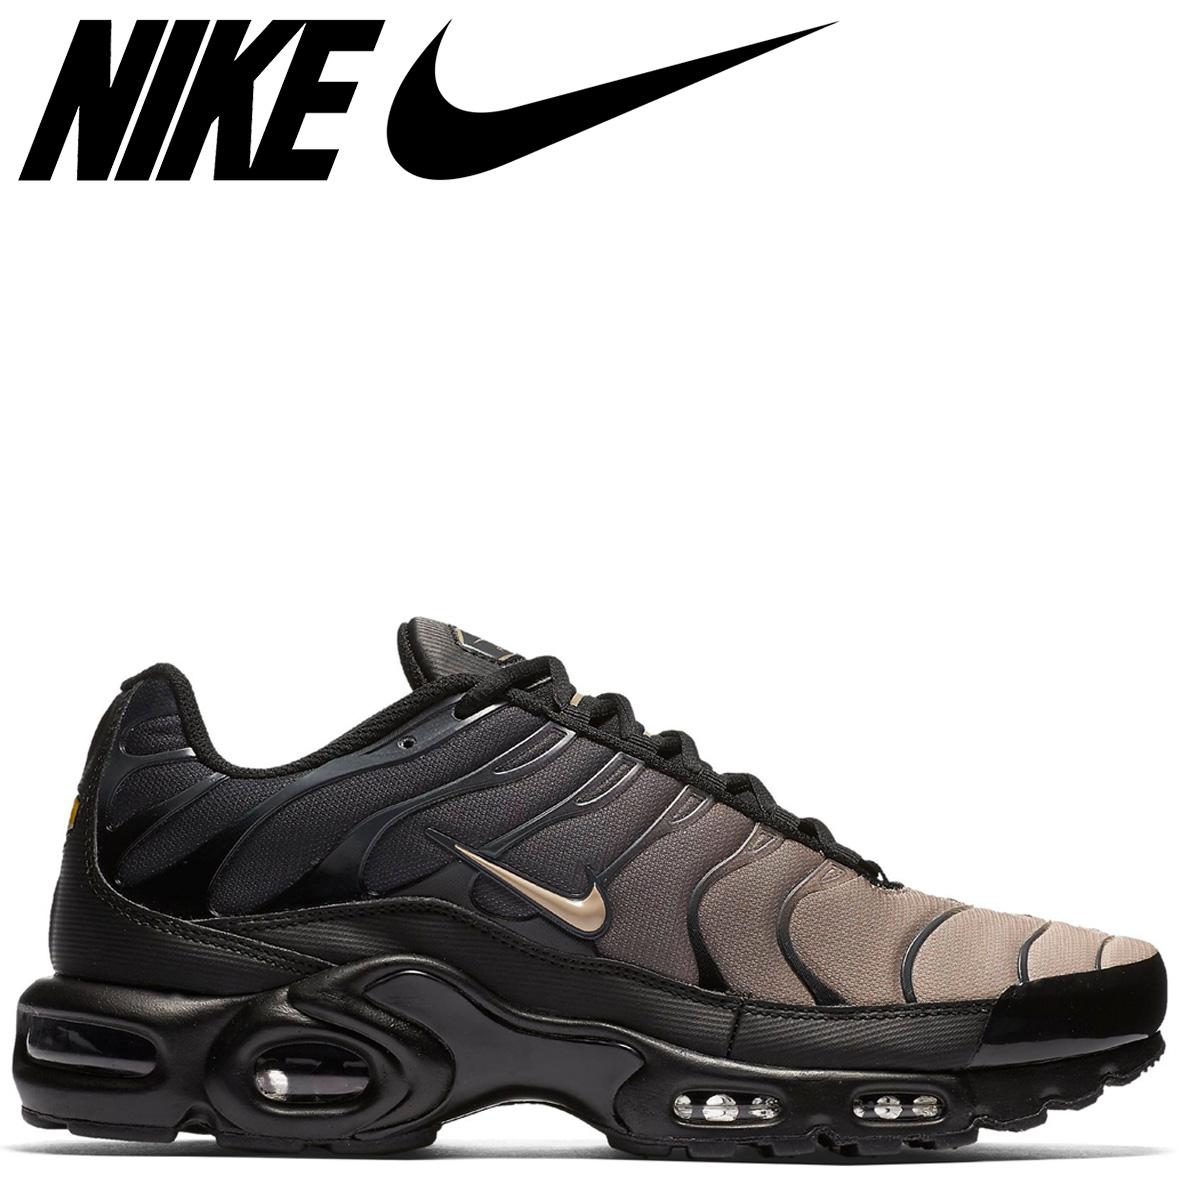 6c09e138e5 ... spain hot sales 4d626 301eb nike nike air max plus sneakers men air max  plus 852630